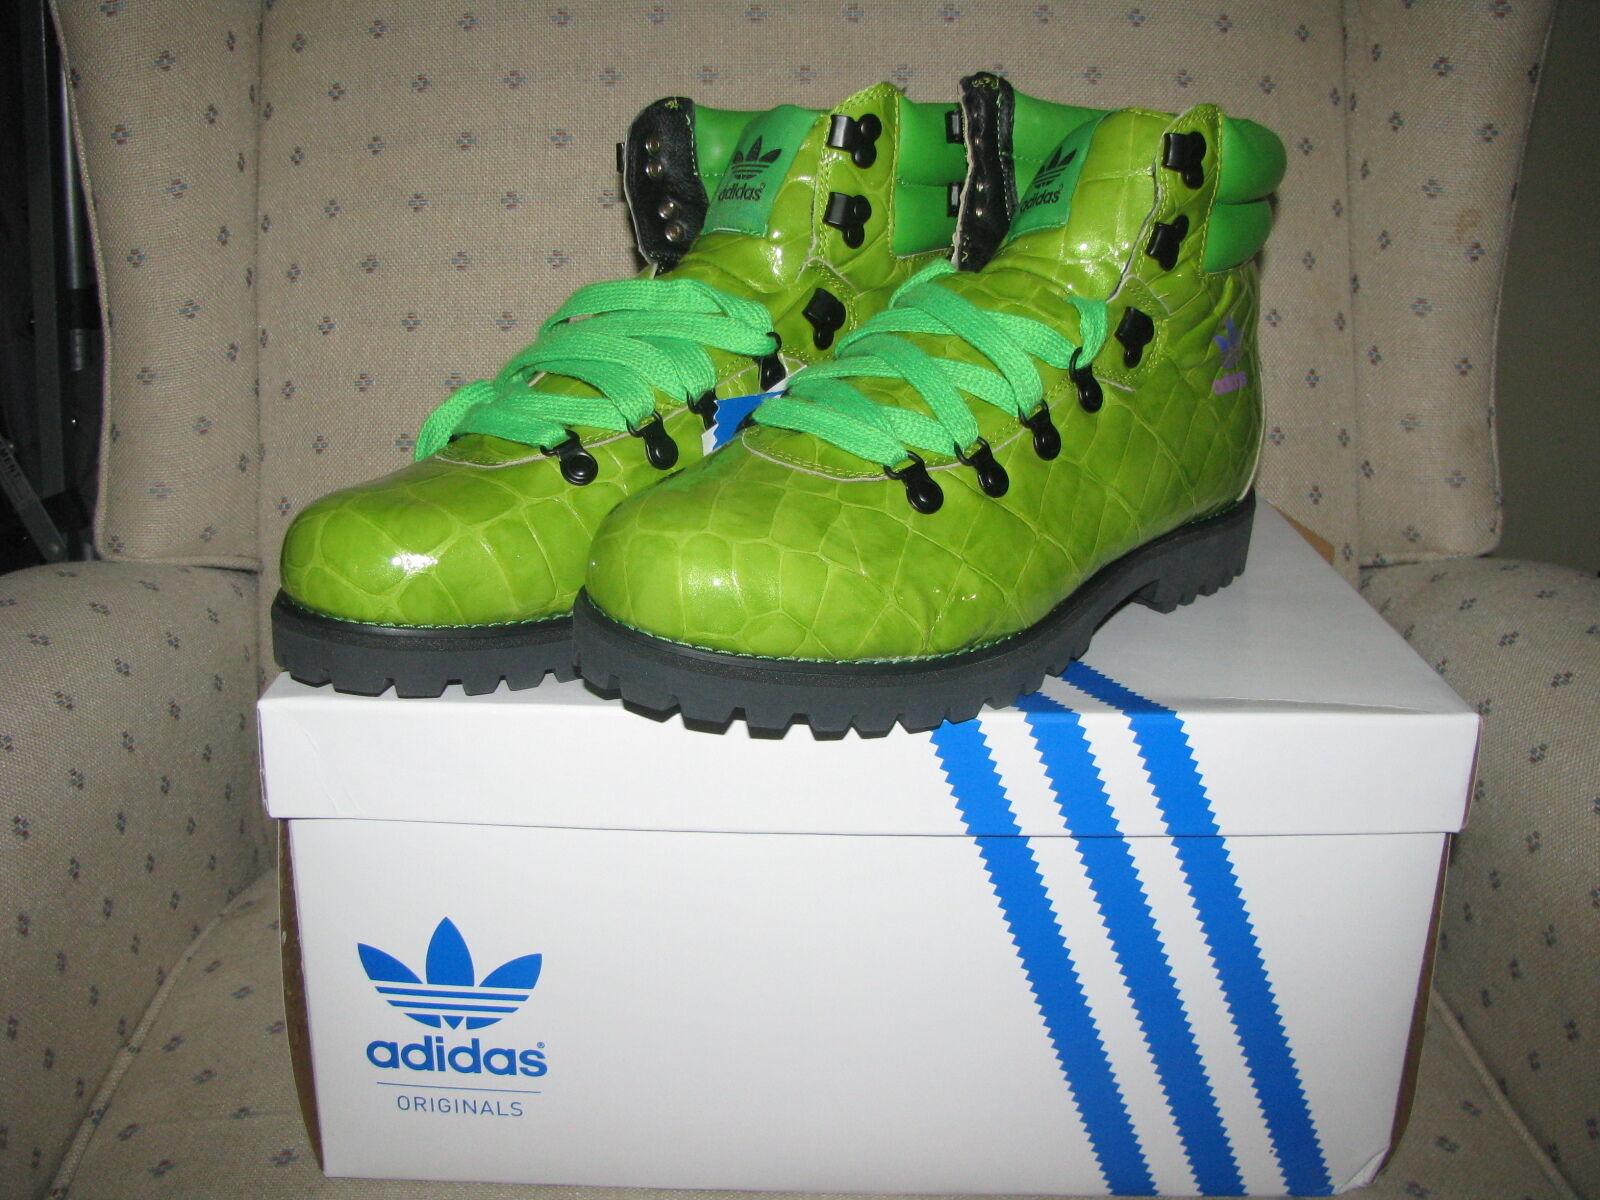 Adidas originali obyo jeremy scott scarpone snow da montagna winter snow scarpone leopard gorilla ali 804dd5